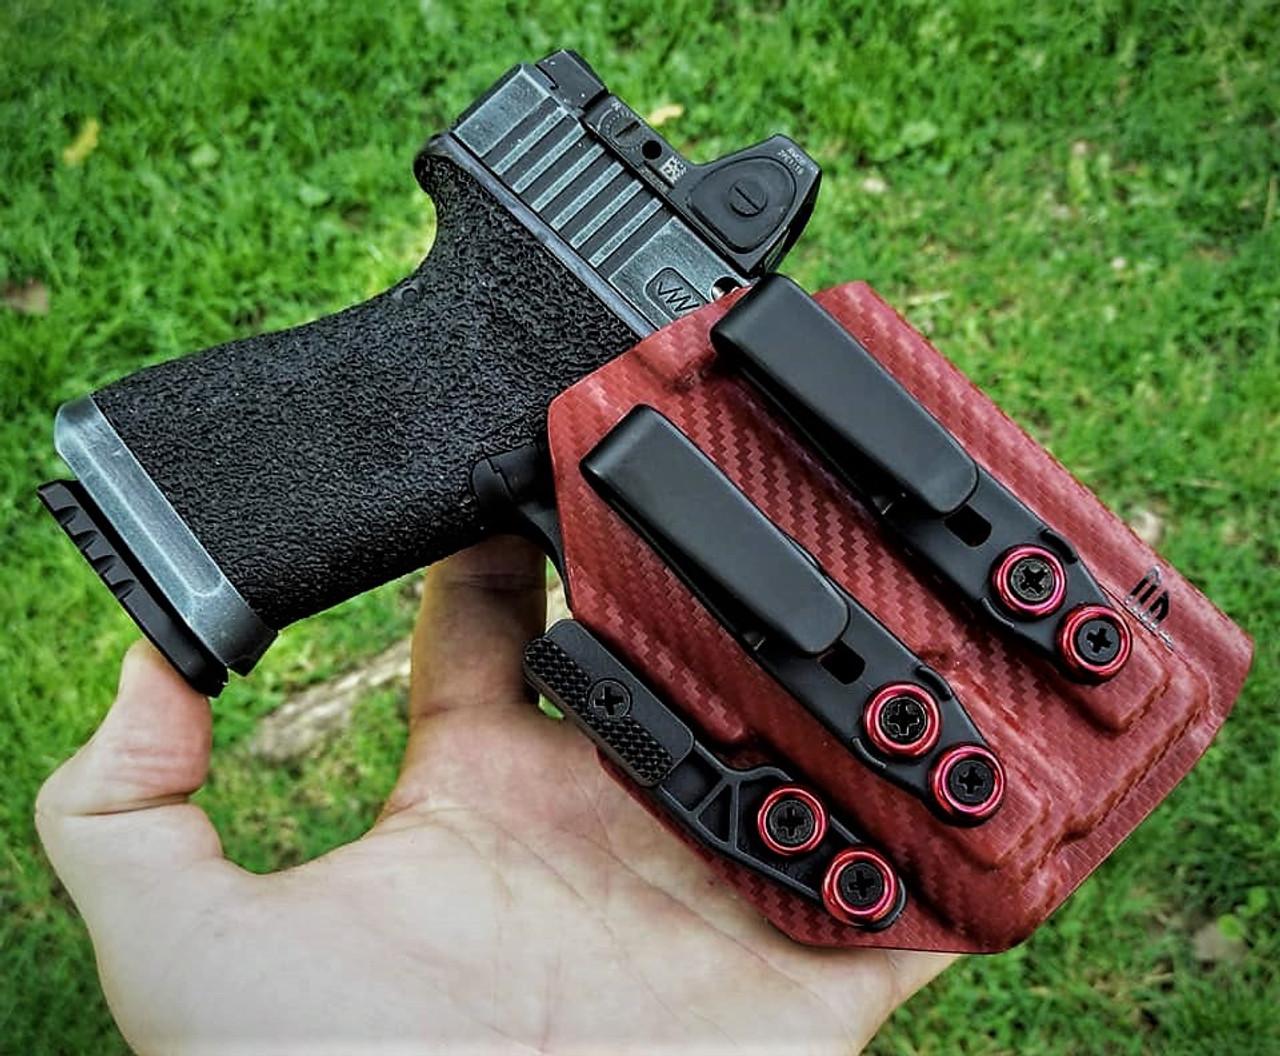 Glock 19 Inforce APLc Holster